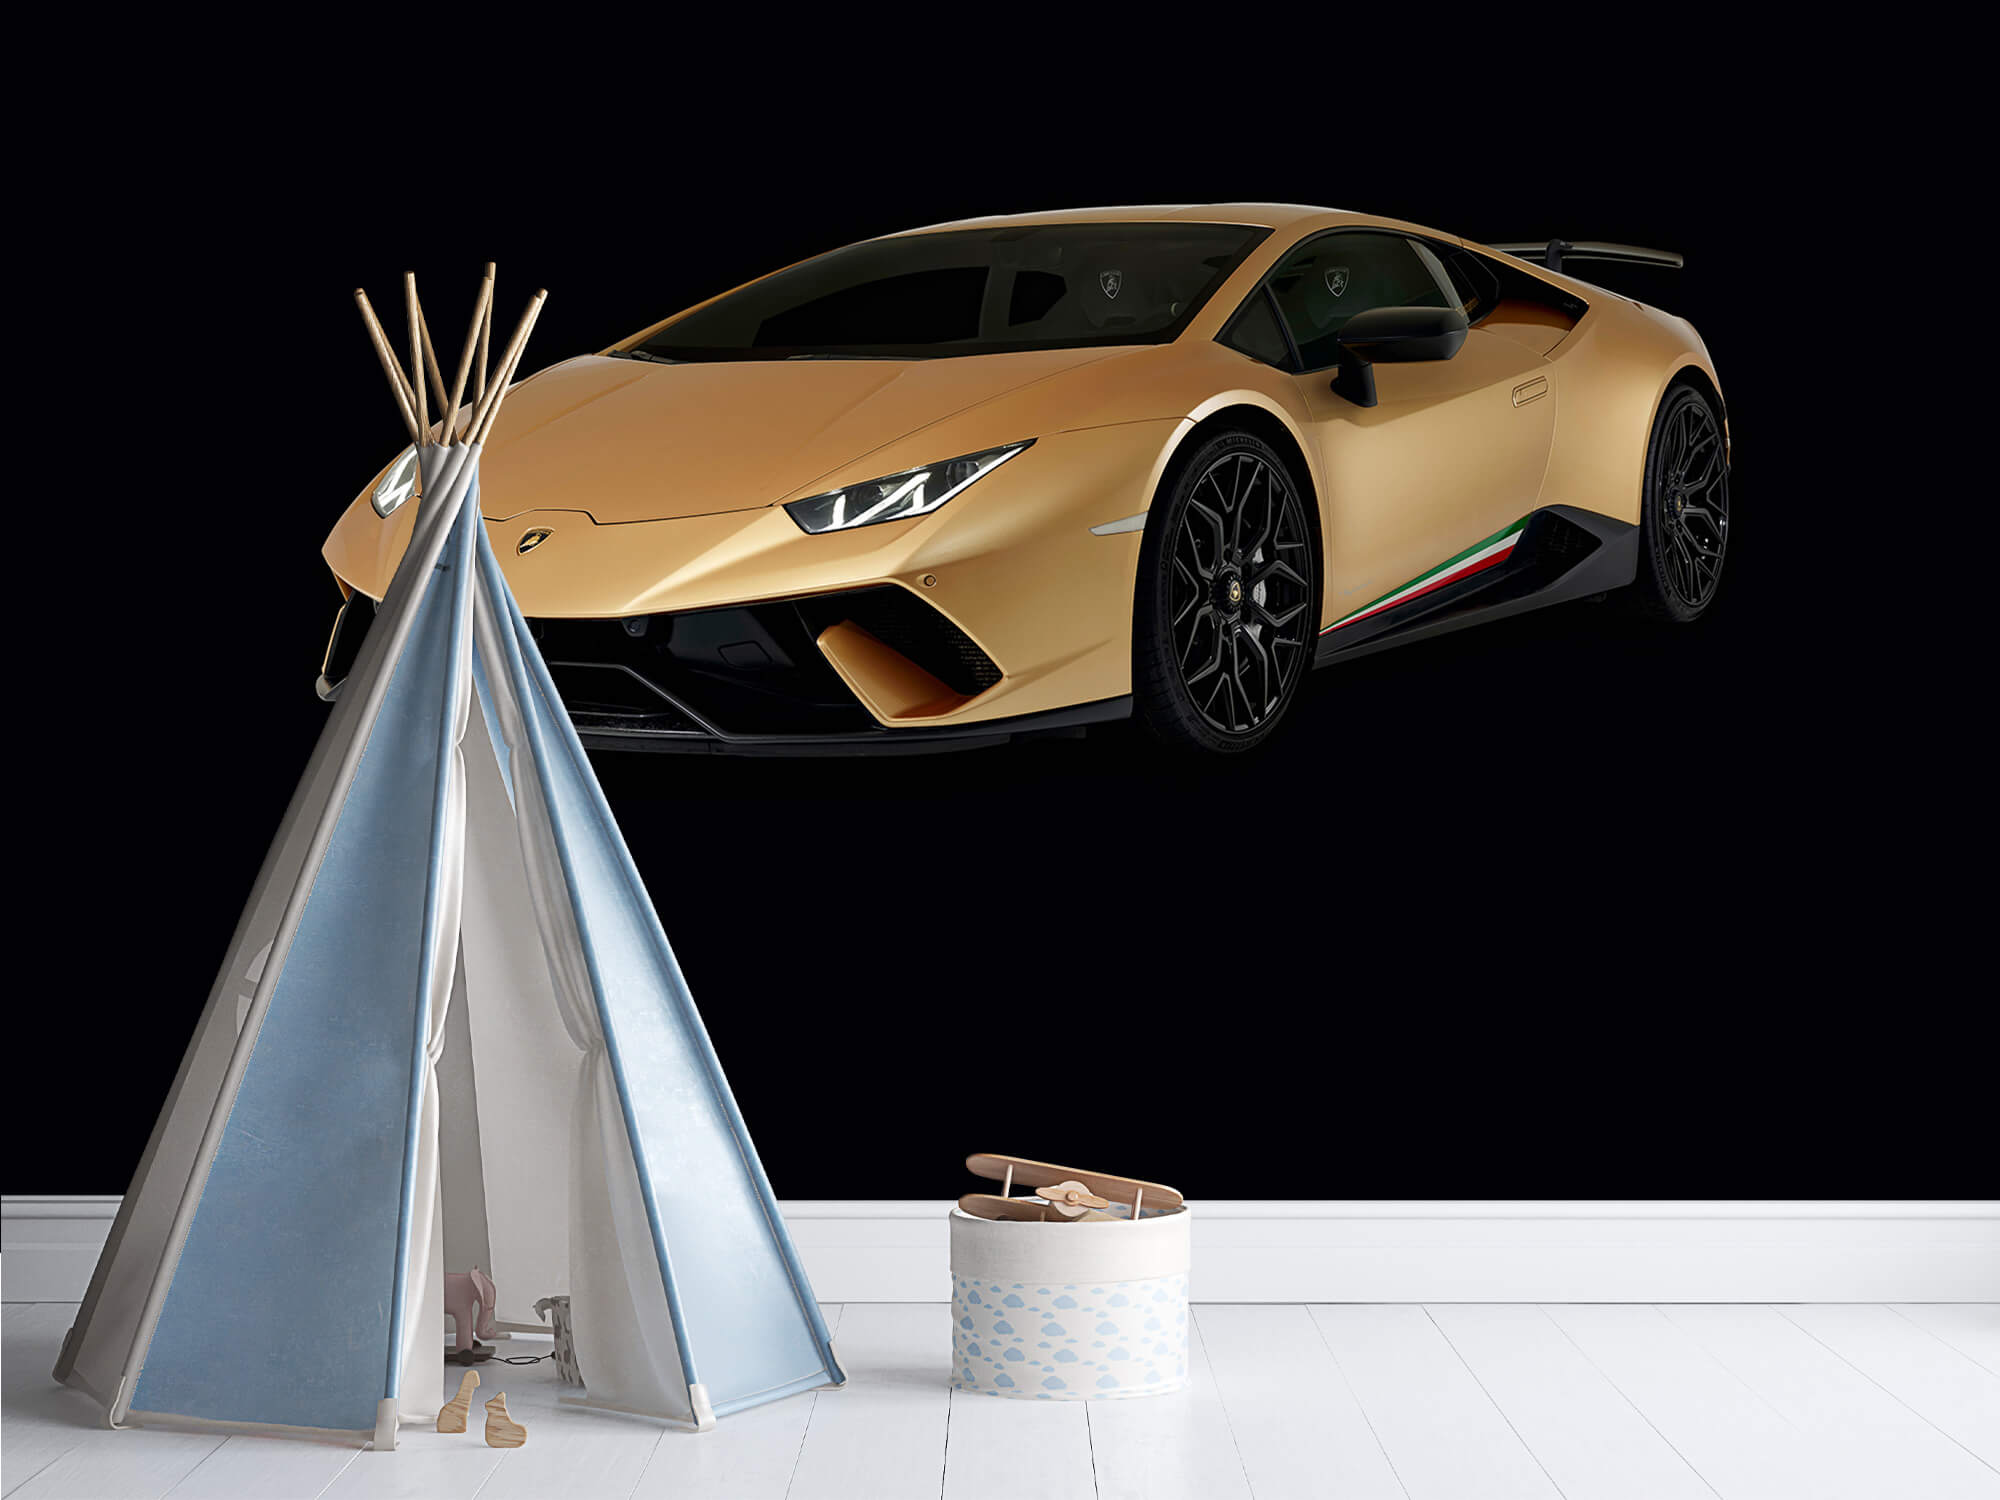 Wallpaper Lamborghini Huracán - Rechter voorkant, zwart 12